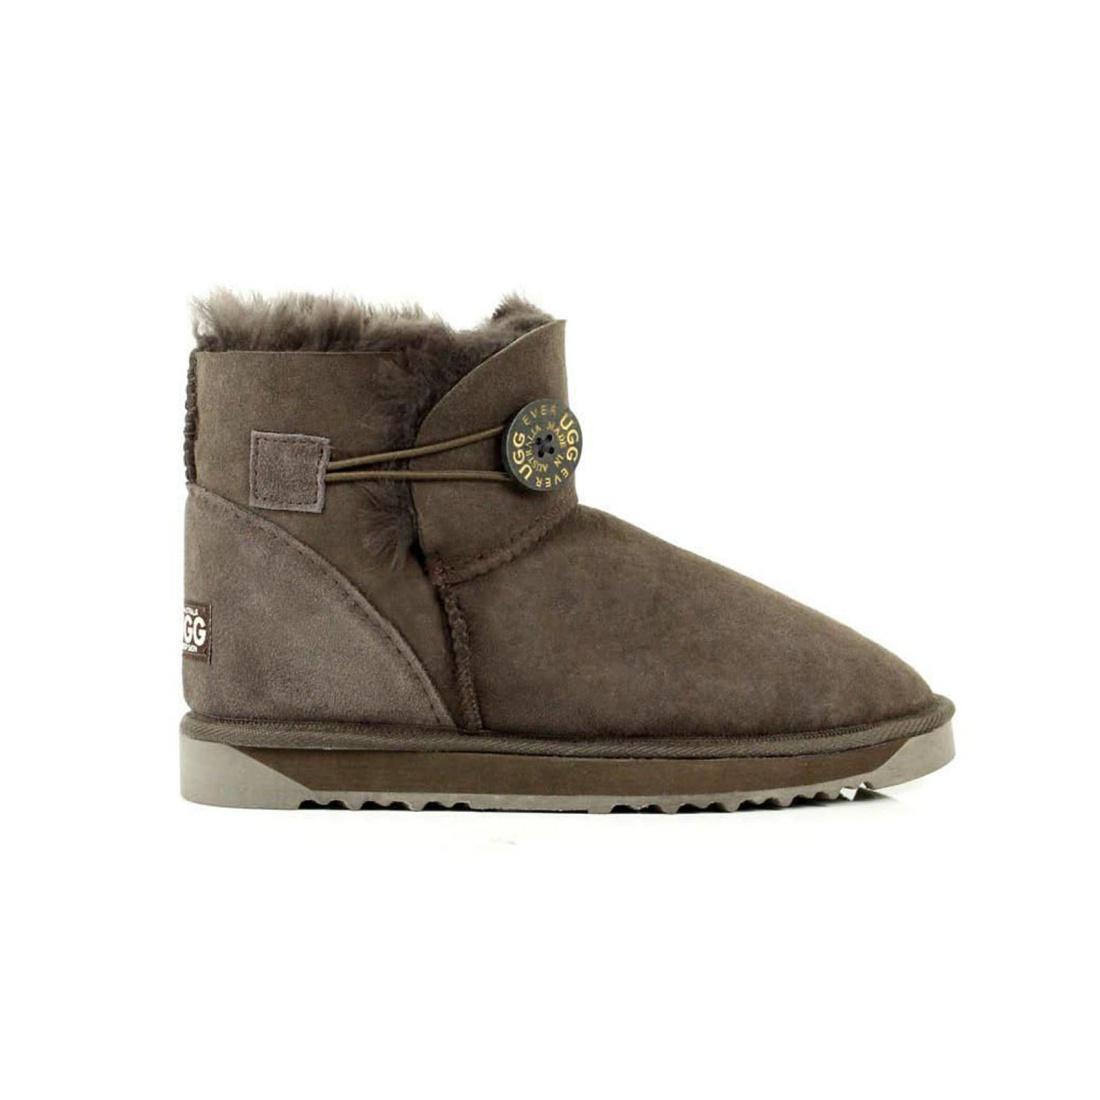 UGG Button Ankle Boots Mini - Chocolate - AU Women 5 / Men 3